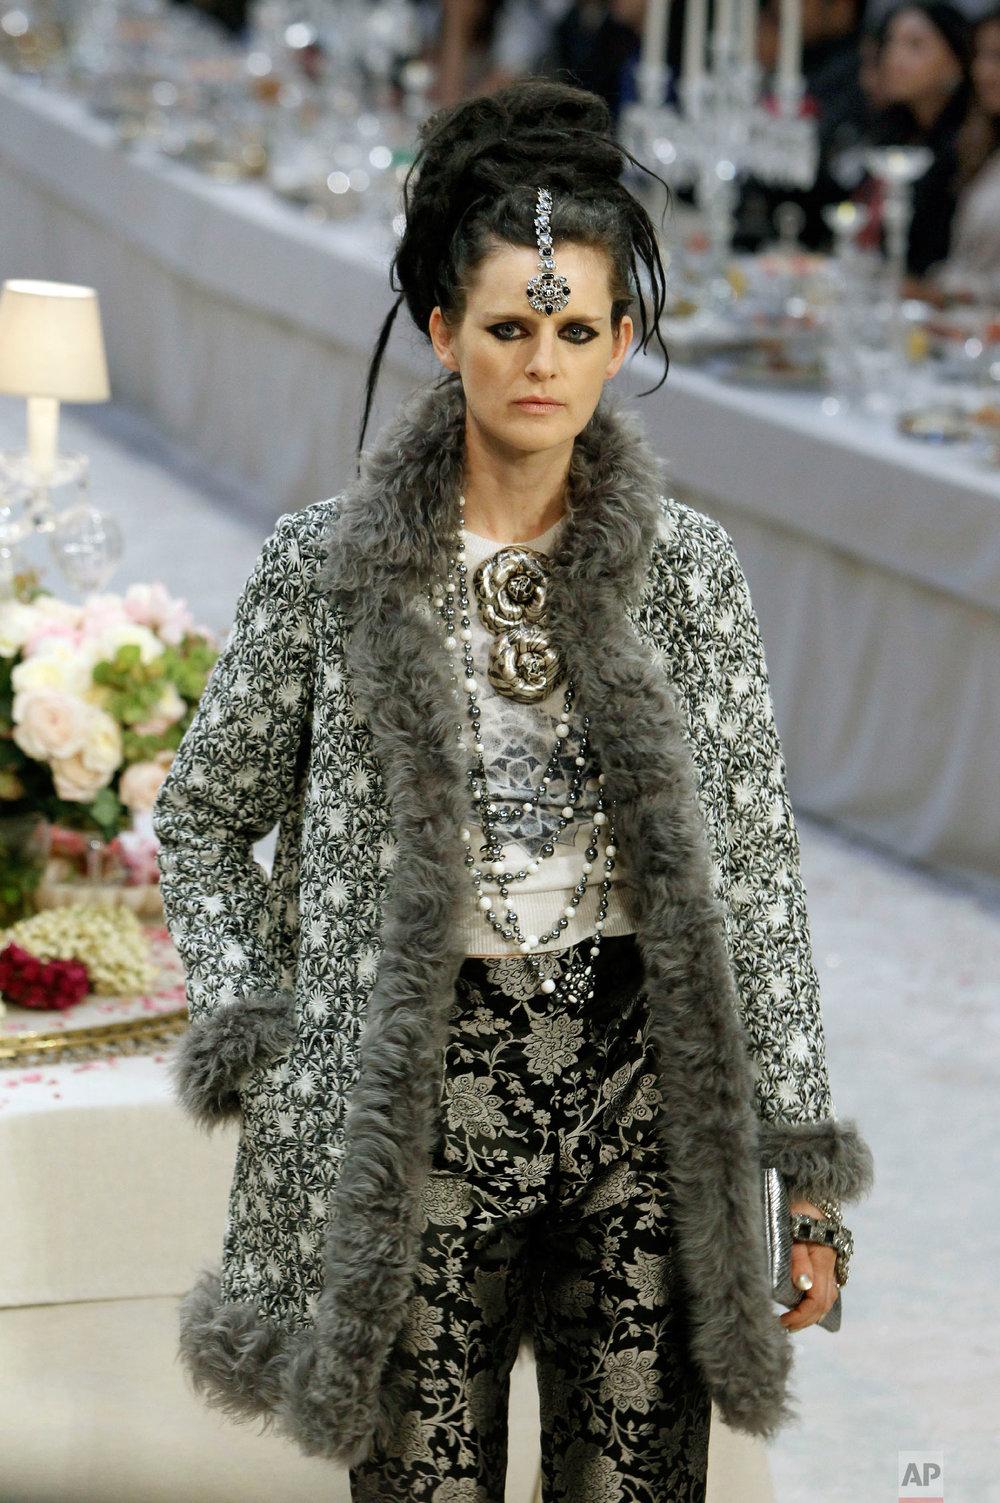 Model Stella Tennant presents a creation by Karl Lagerfeld in Paris, Dec. 6, 2011. (AP Photo/Remy de la Mauviniere)